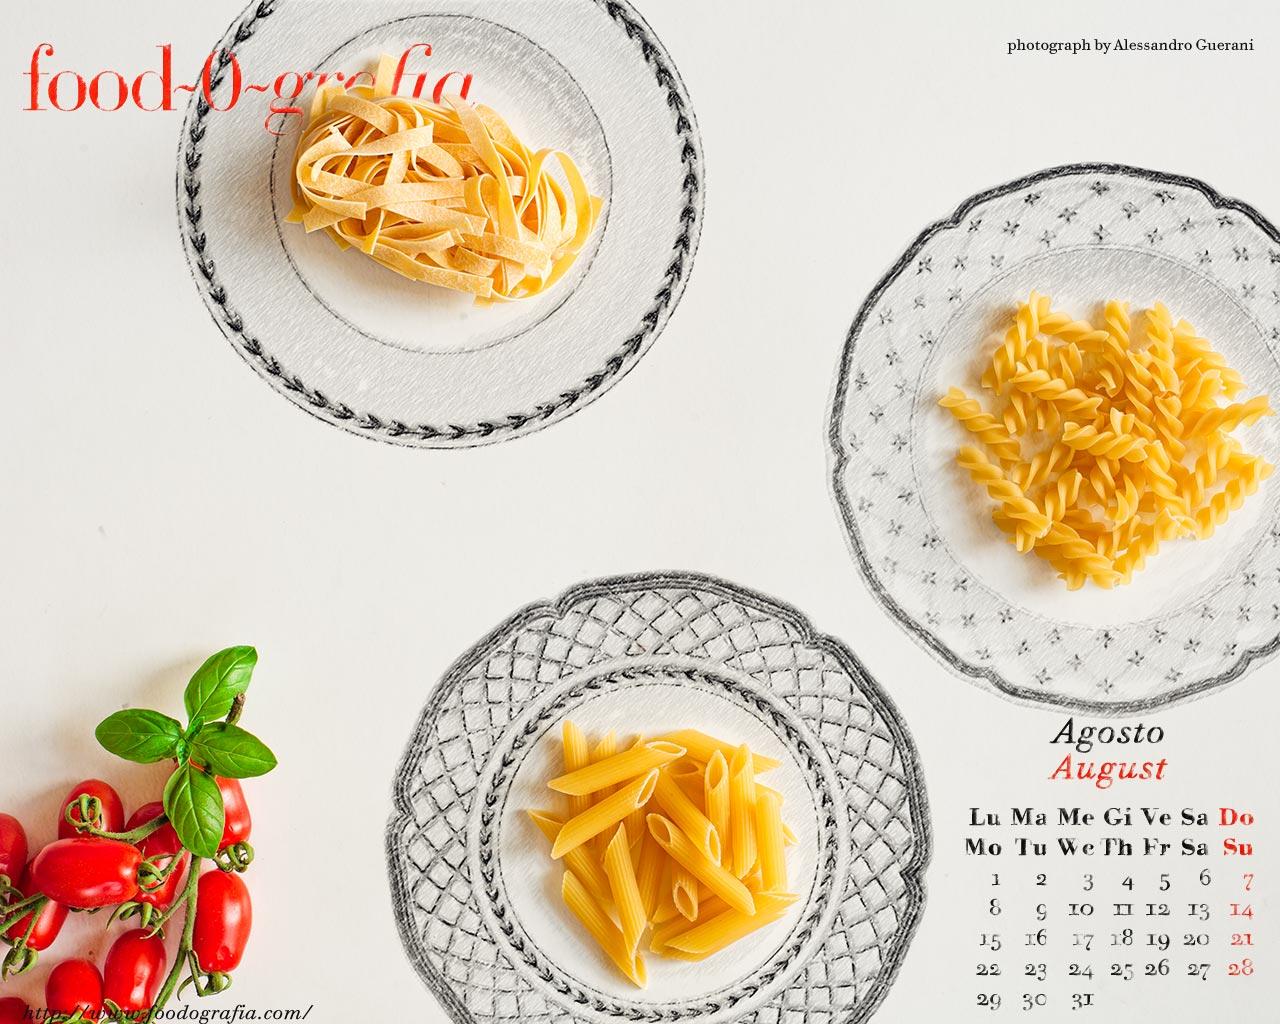 http://1.bp.blogspot.com/-_23qlW25aFU/Tjf5mvKkAlI/AAAAAAAADzU/zsPBOh9bvBM/s1600/foodografia-calendar-aug-2011-1280.jpg